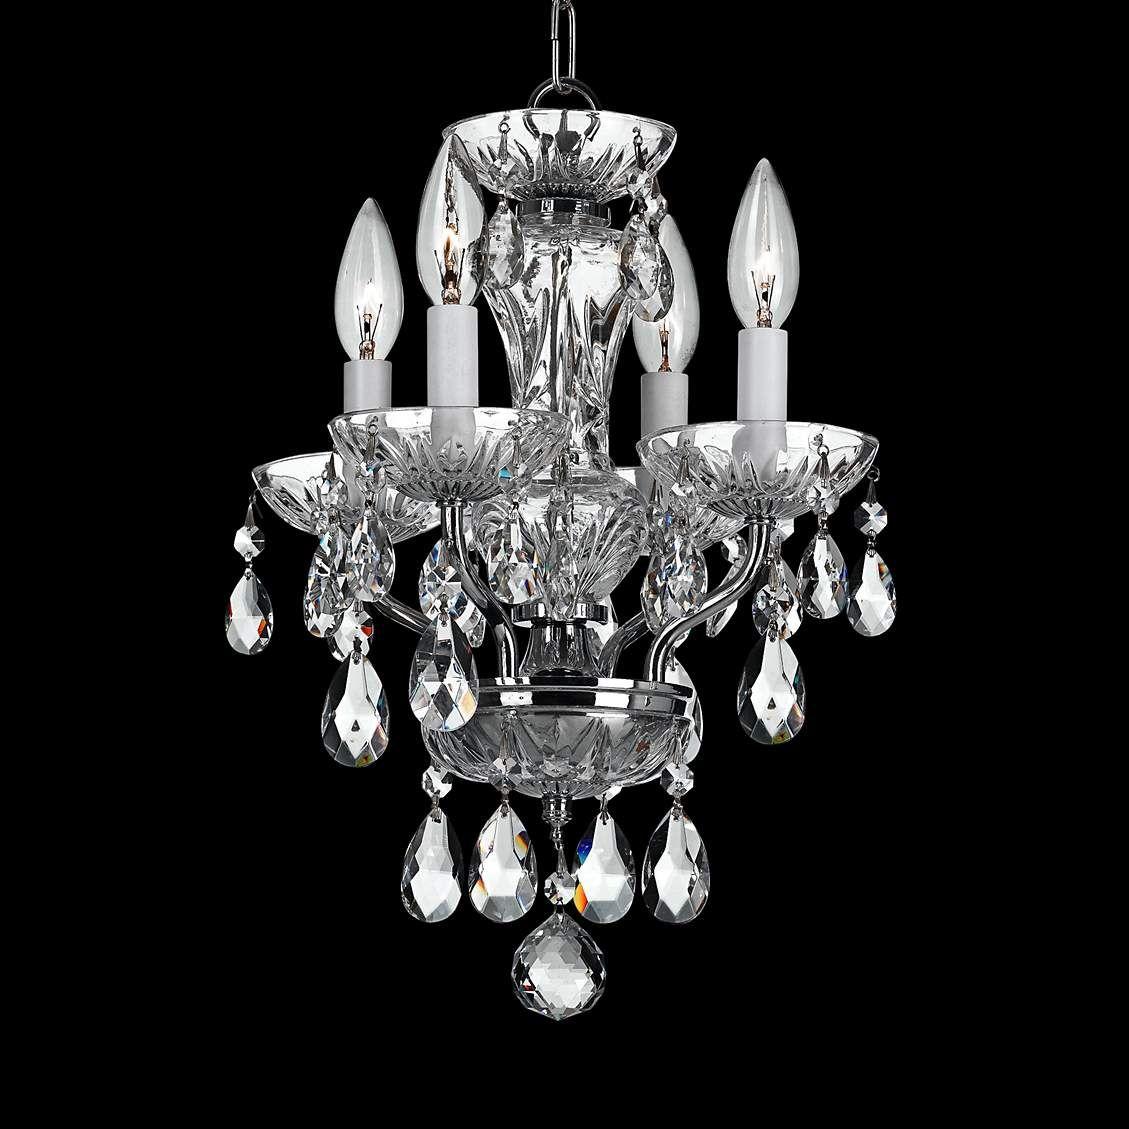 Crystorama traditional crystal 11w chrome mini chandelier mini crystorama traditional crystal 11w chrome mini chandelier arubaitofo Image collections